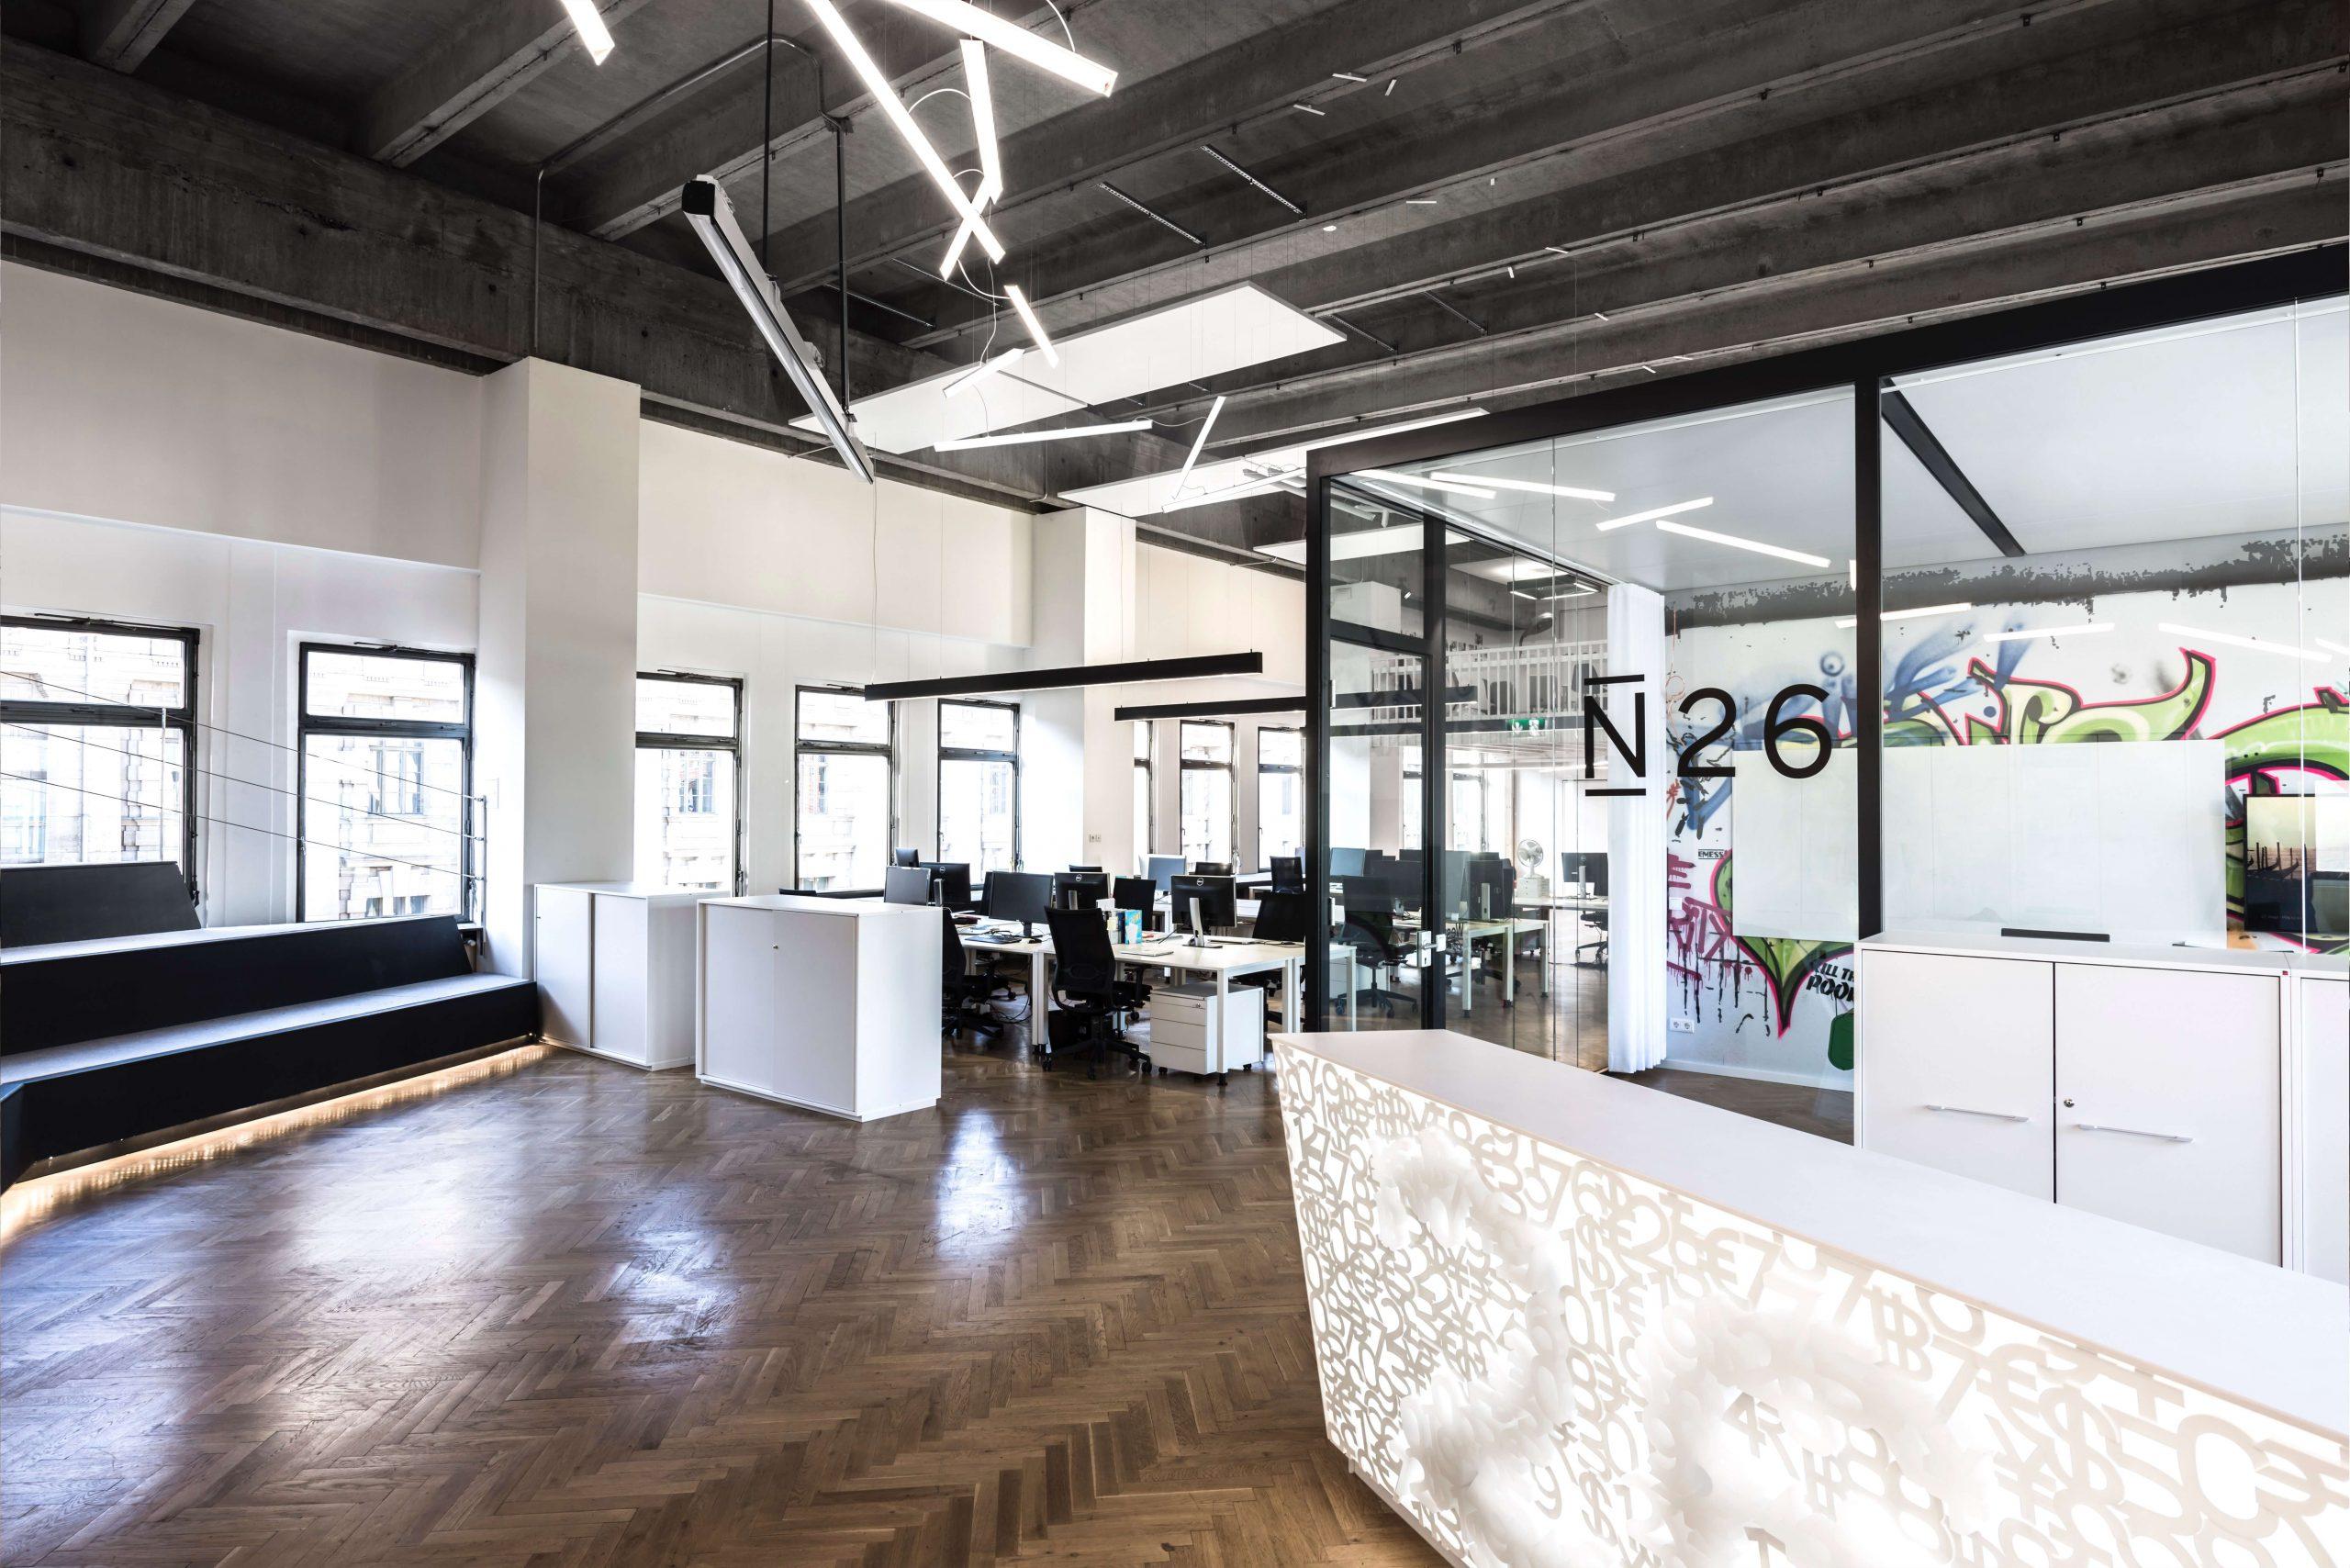 New Work Büro Startup N26 Architekturbüro TKEZ Emfpang